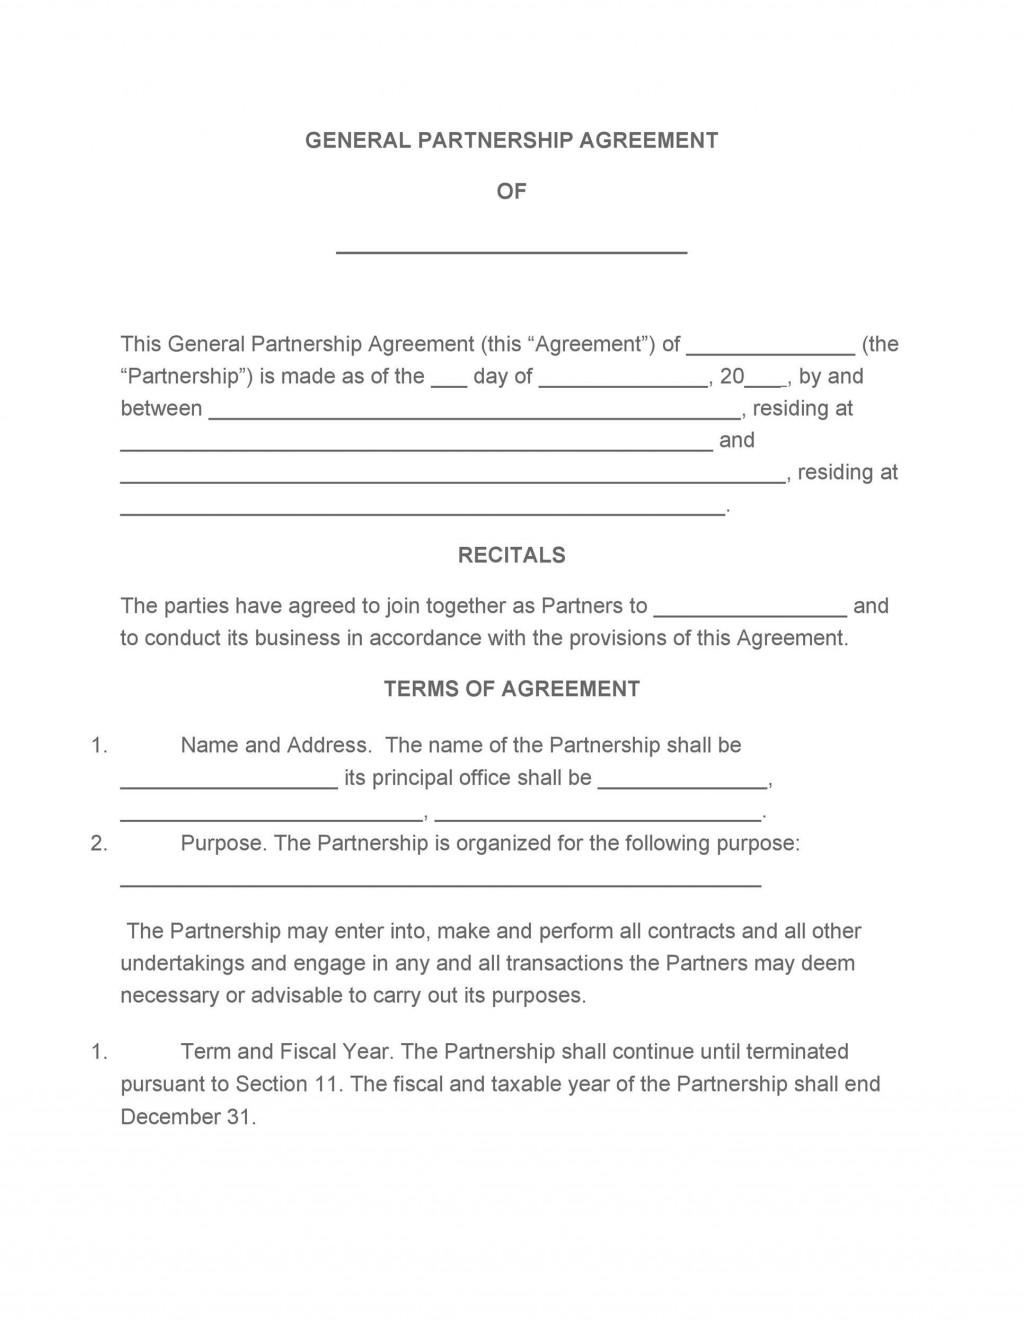 007 Impressive General Partnership Agreement Template High Definition  Word Canada Sample FreeLarge